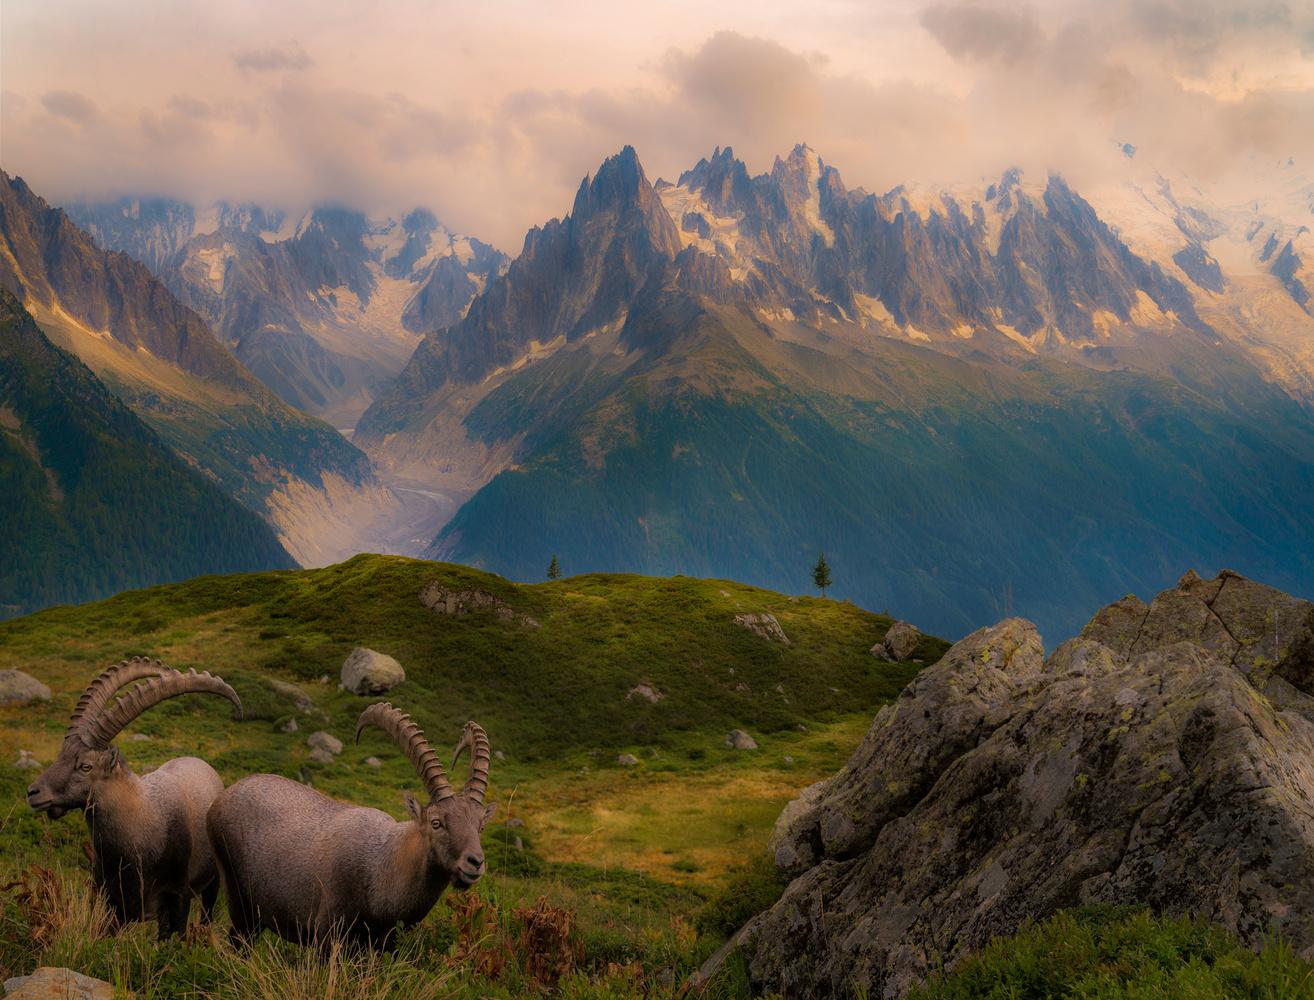 The Mountain Experience by Corin Vilanek